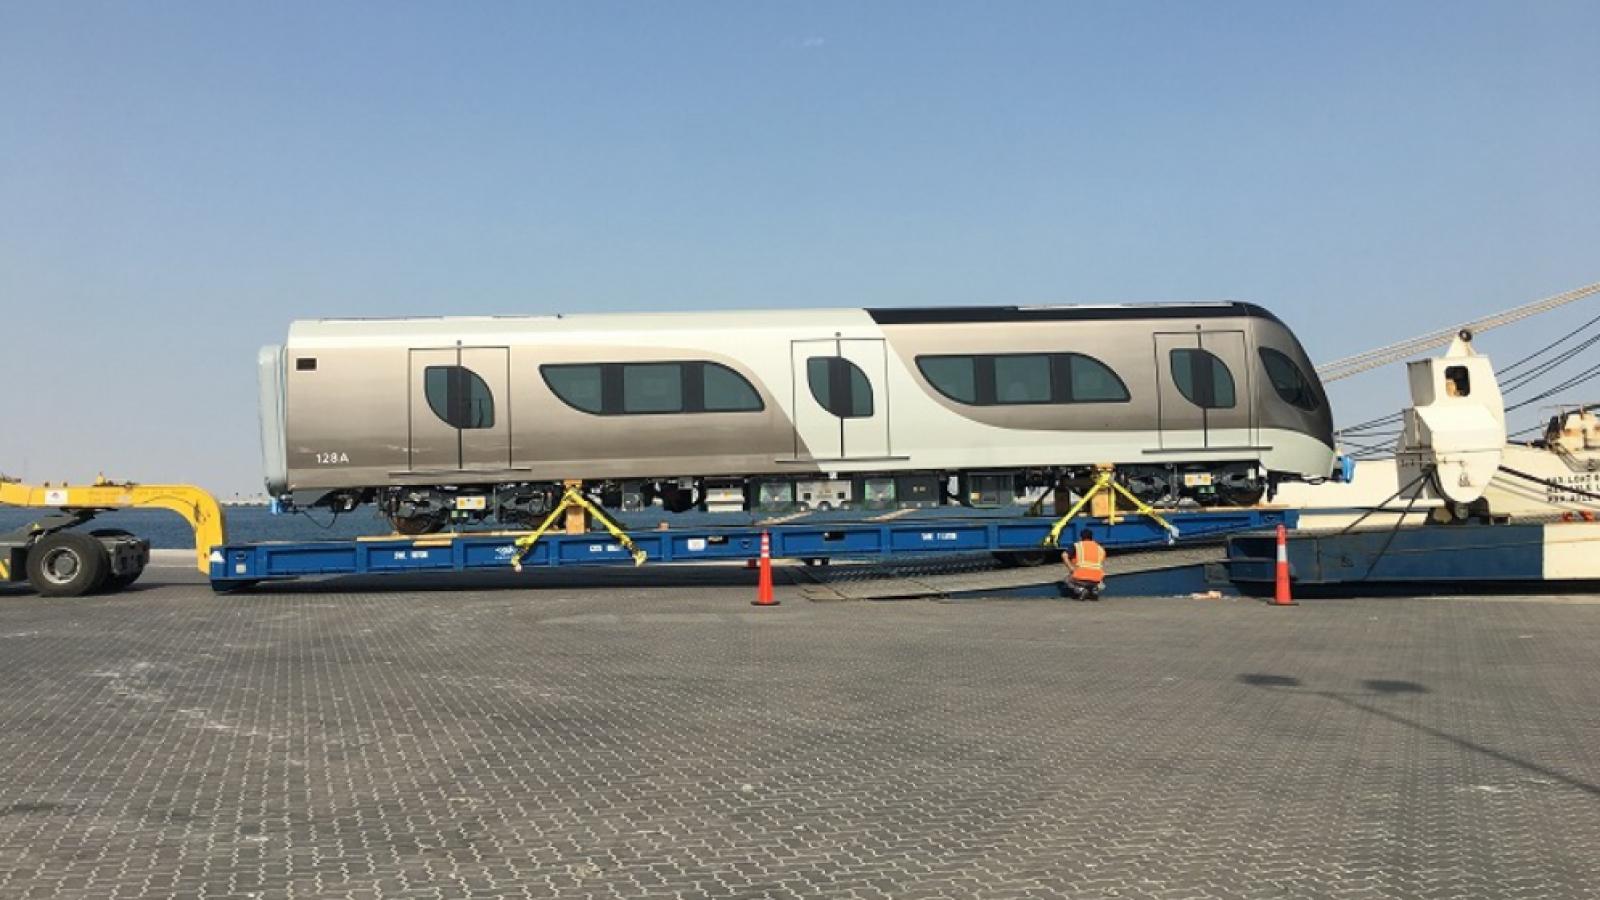 WATCH: Qatar Rail received a batch of two additional trains at Hamad Port